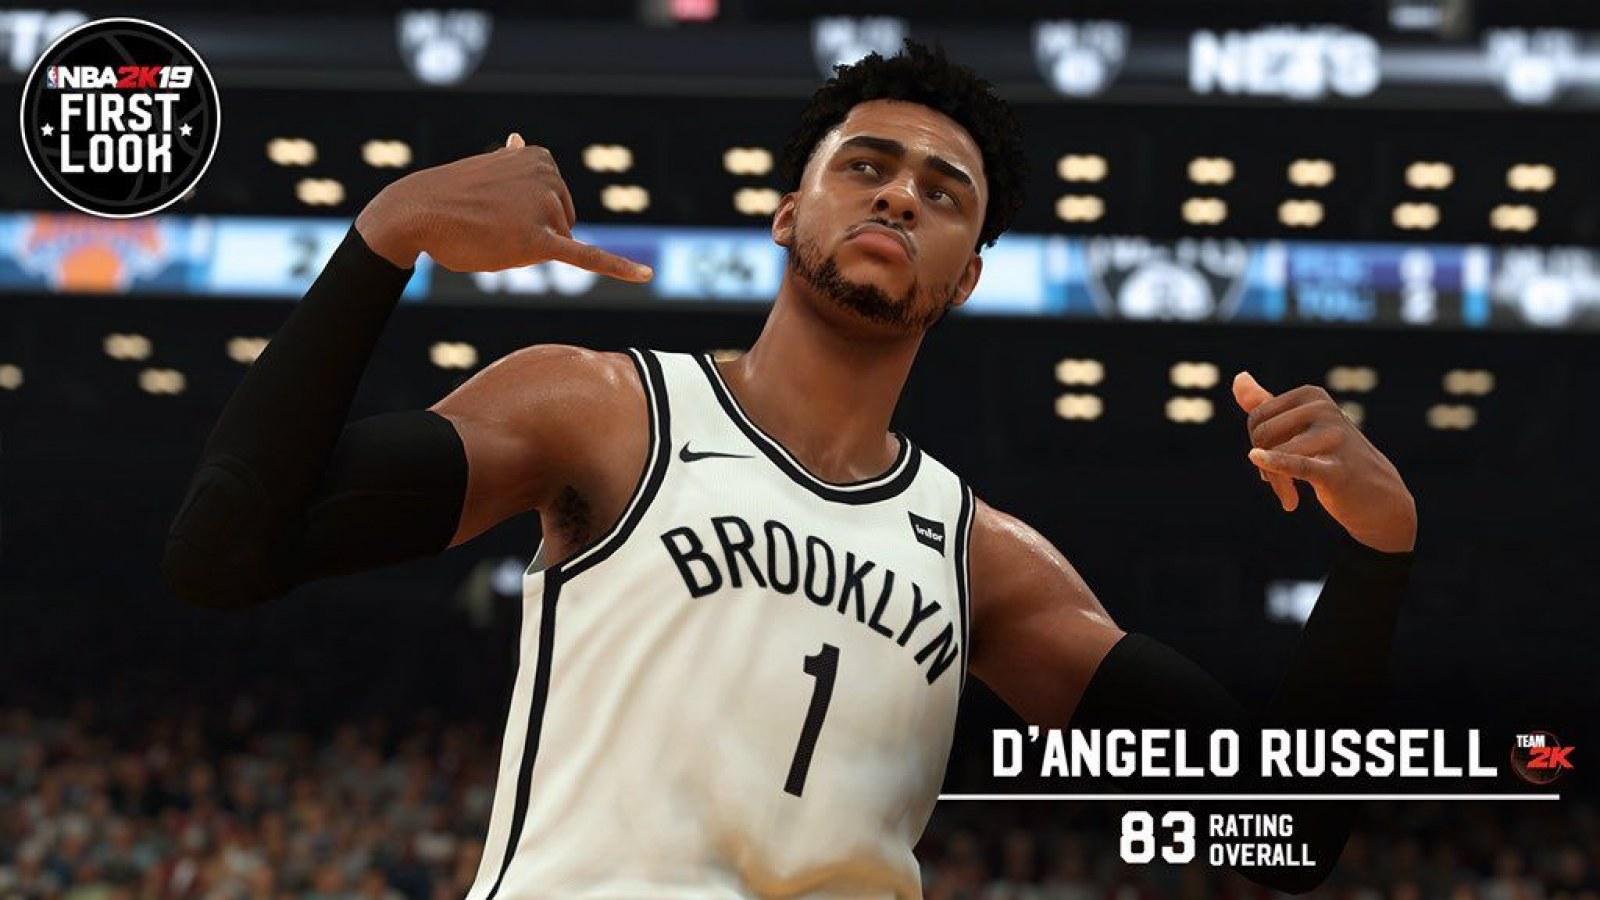 3aad834605c 'NBA 2K19' Player Ratings List: LeBron James, DeMar DeRozan & More